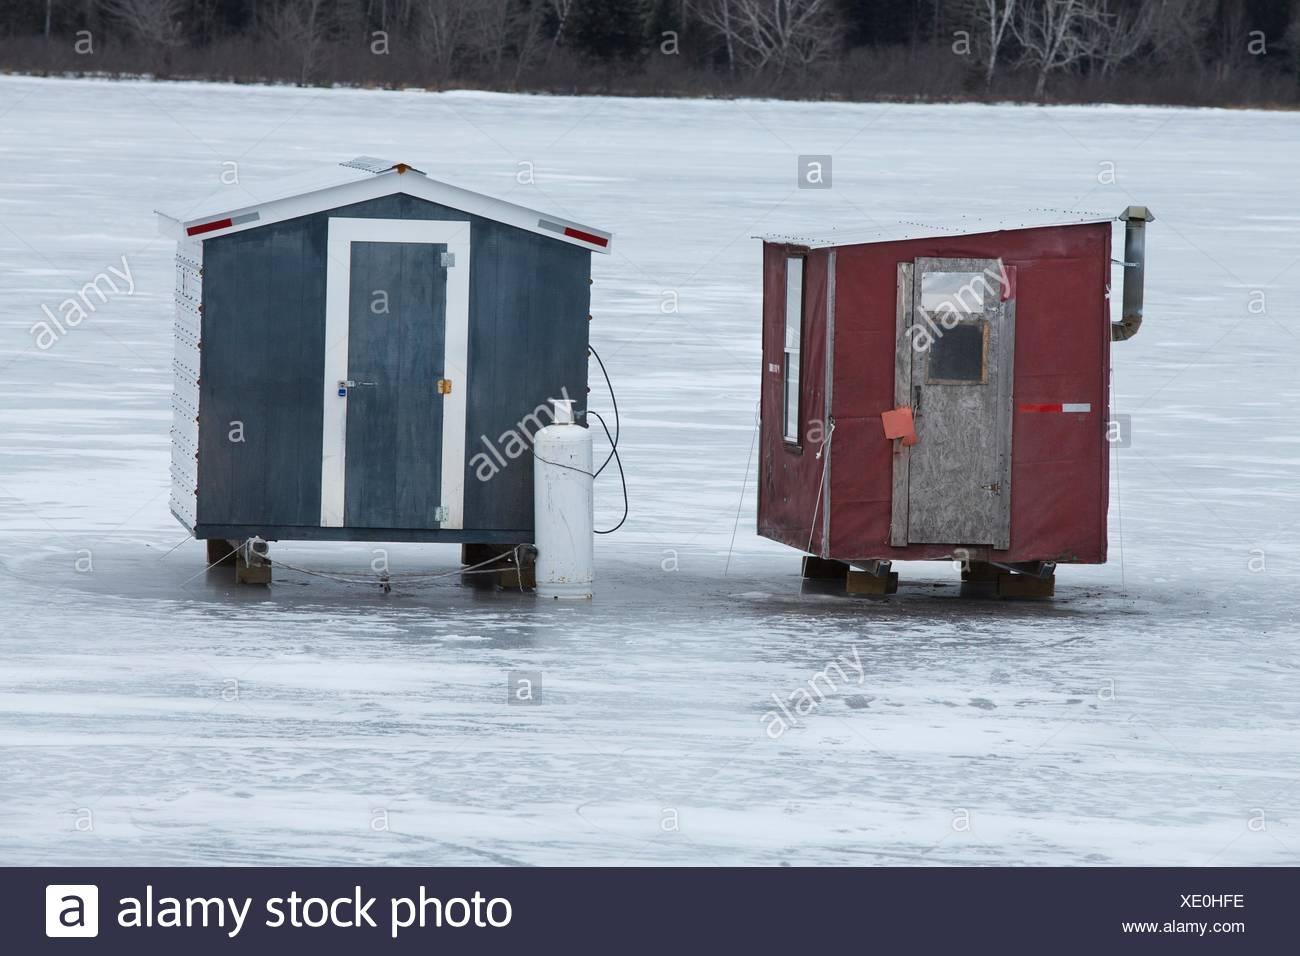 Ice fishing shack stock photos ice fishing shack stock for Ice fishing shacks